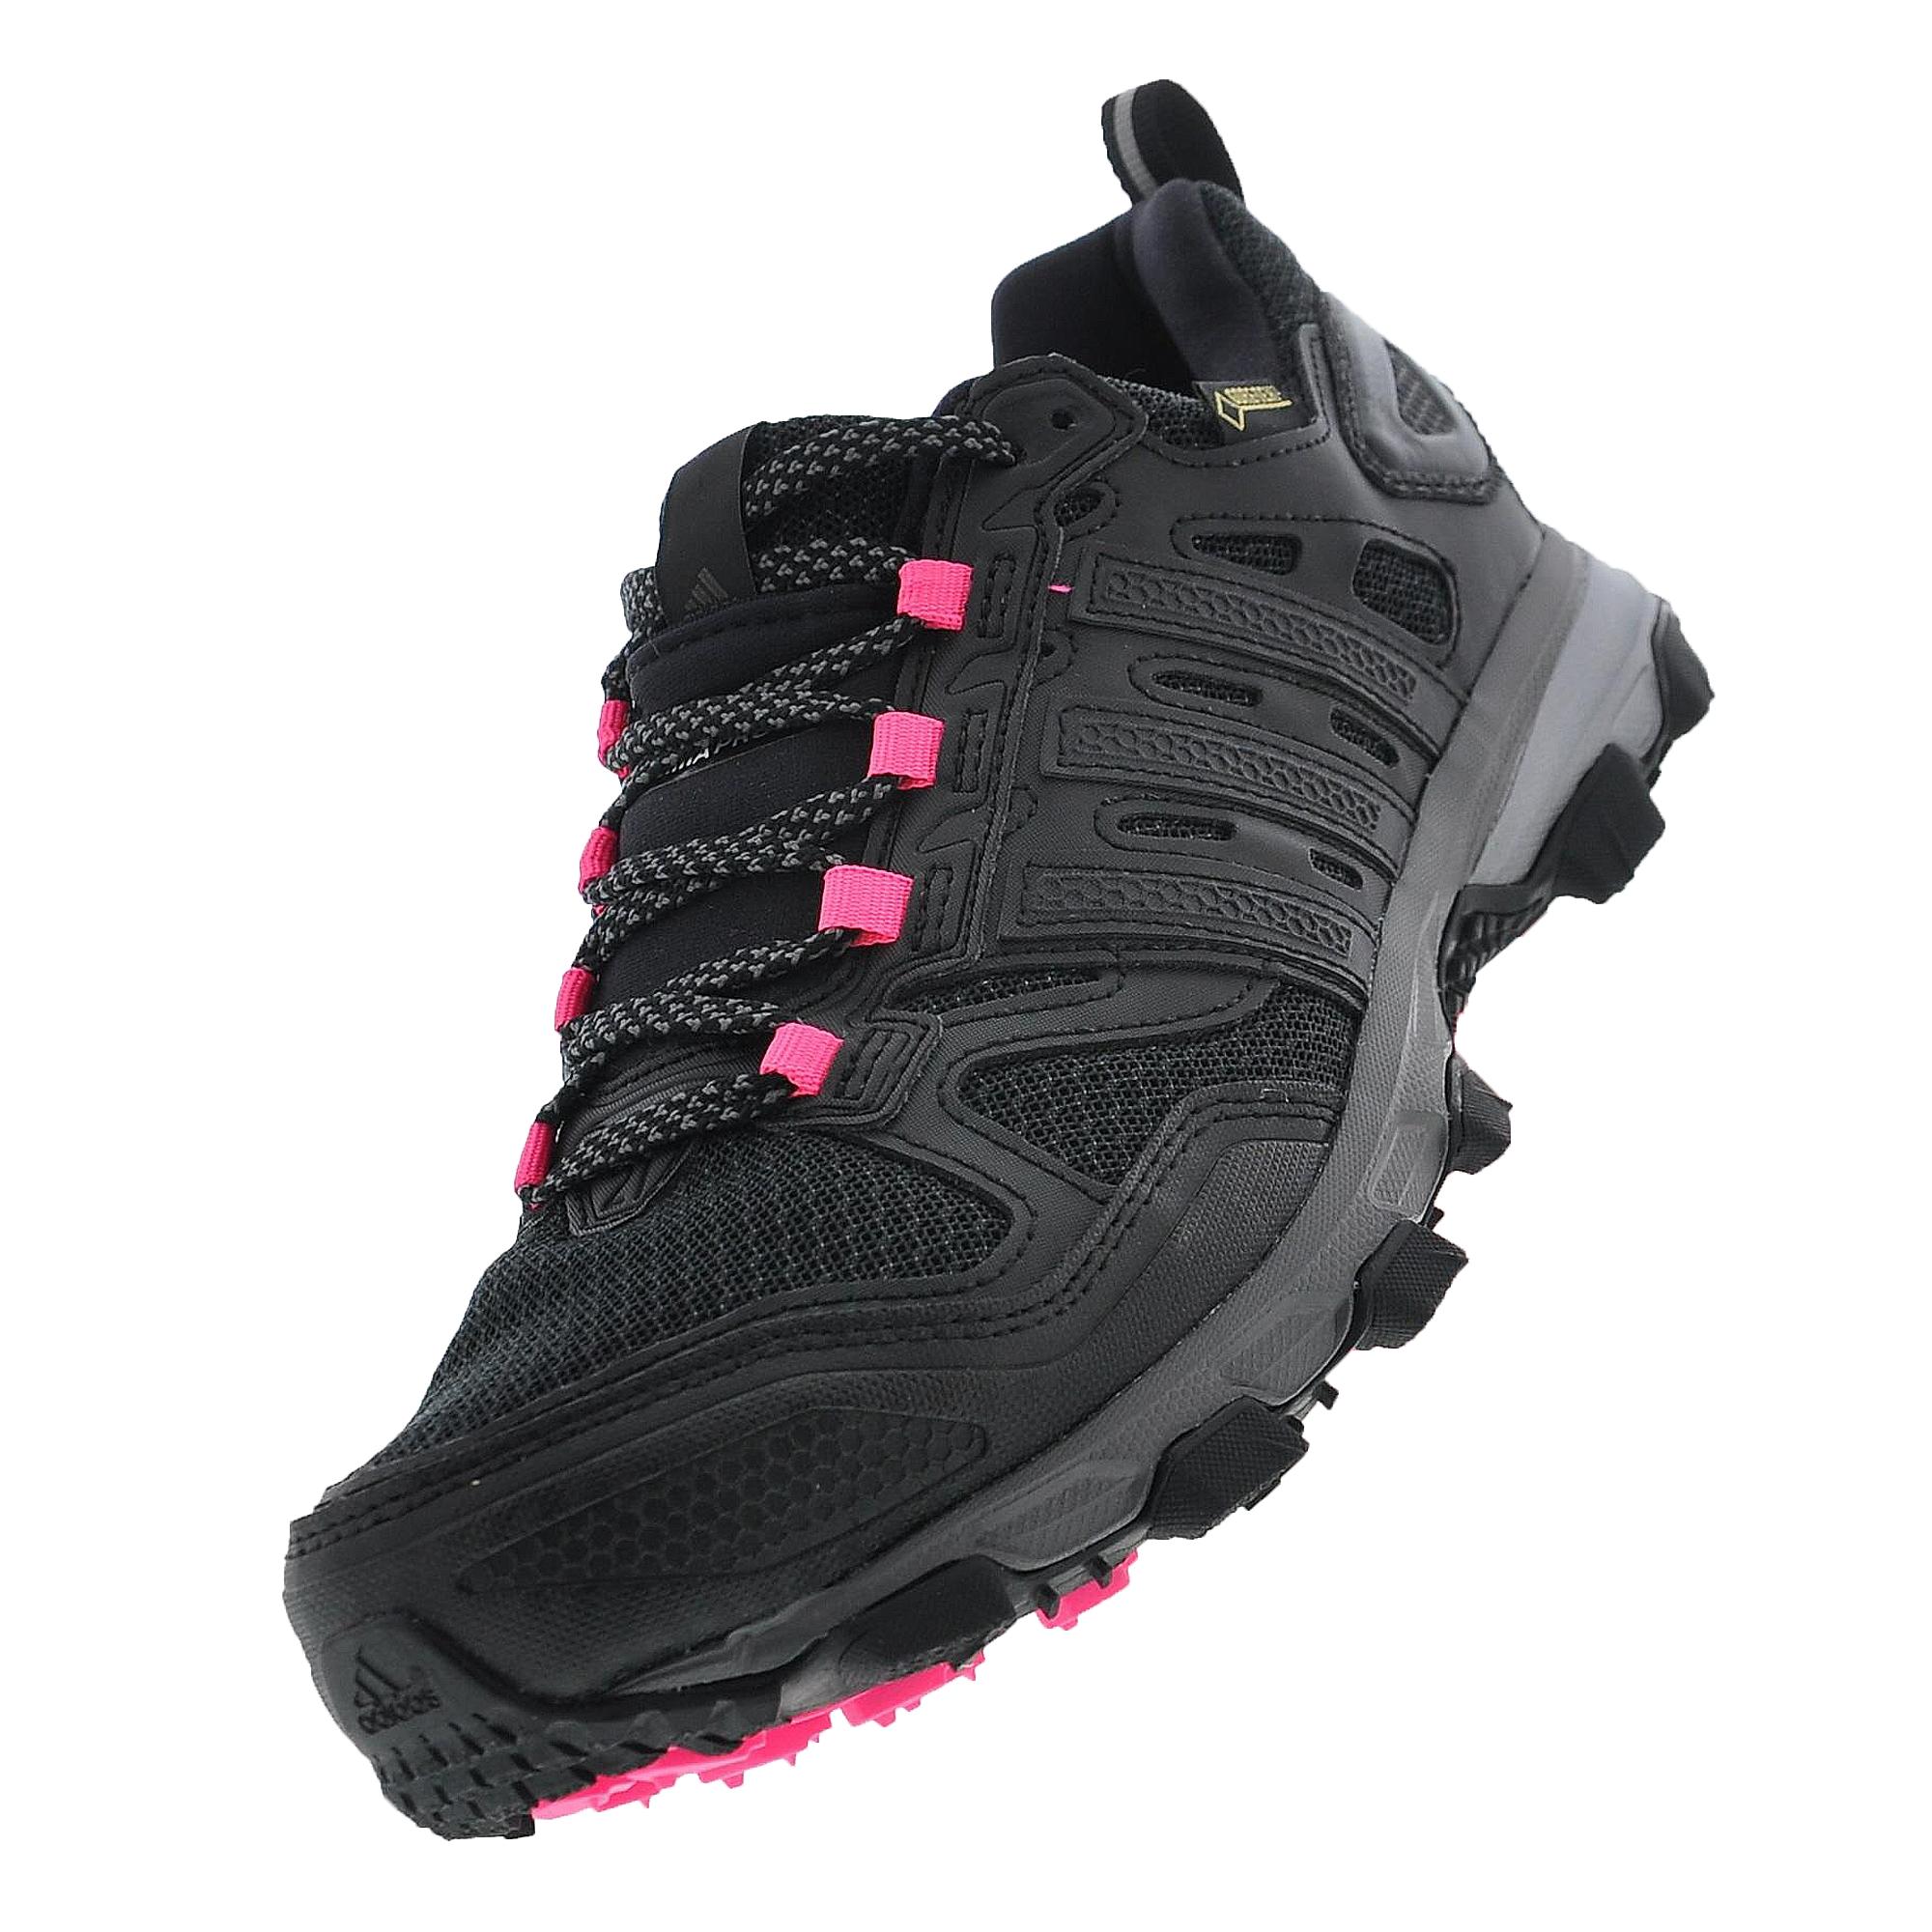 new product c28f8 e9fea adidas Response Trail 21 Gore-tex Kadın Spor Ayakkabı